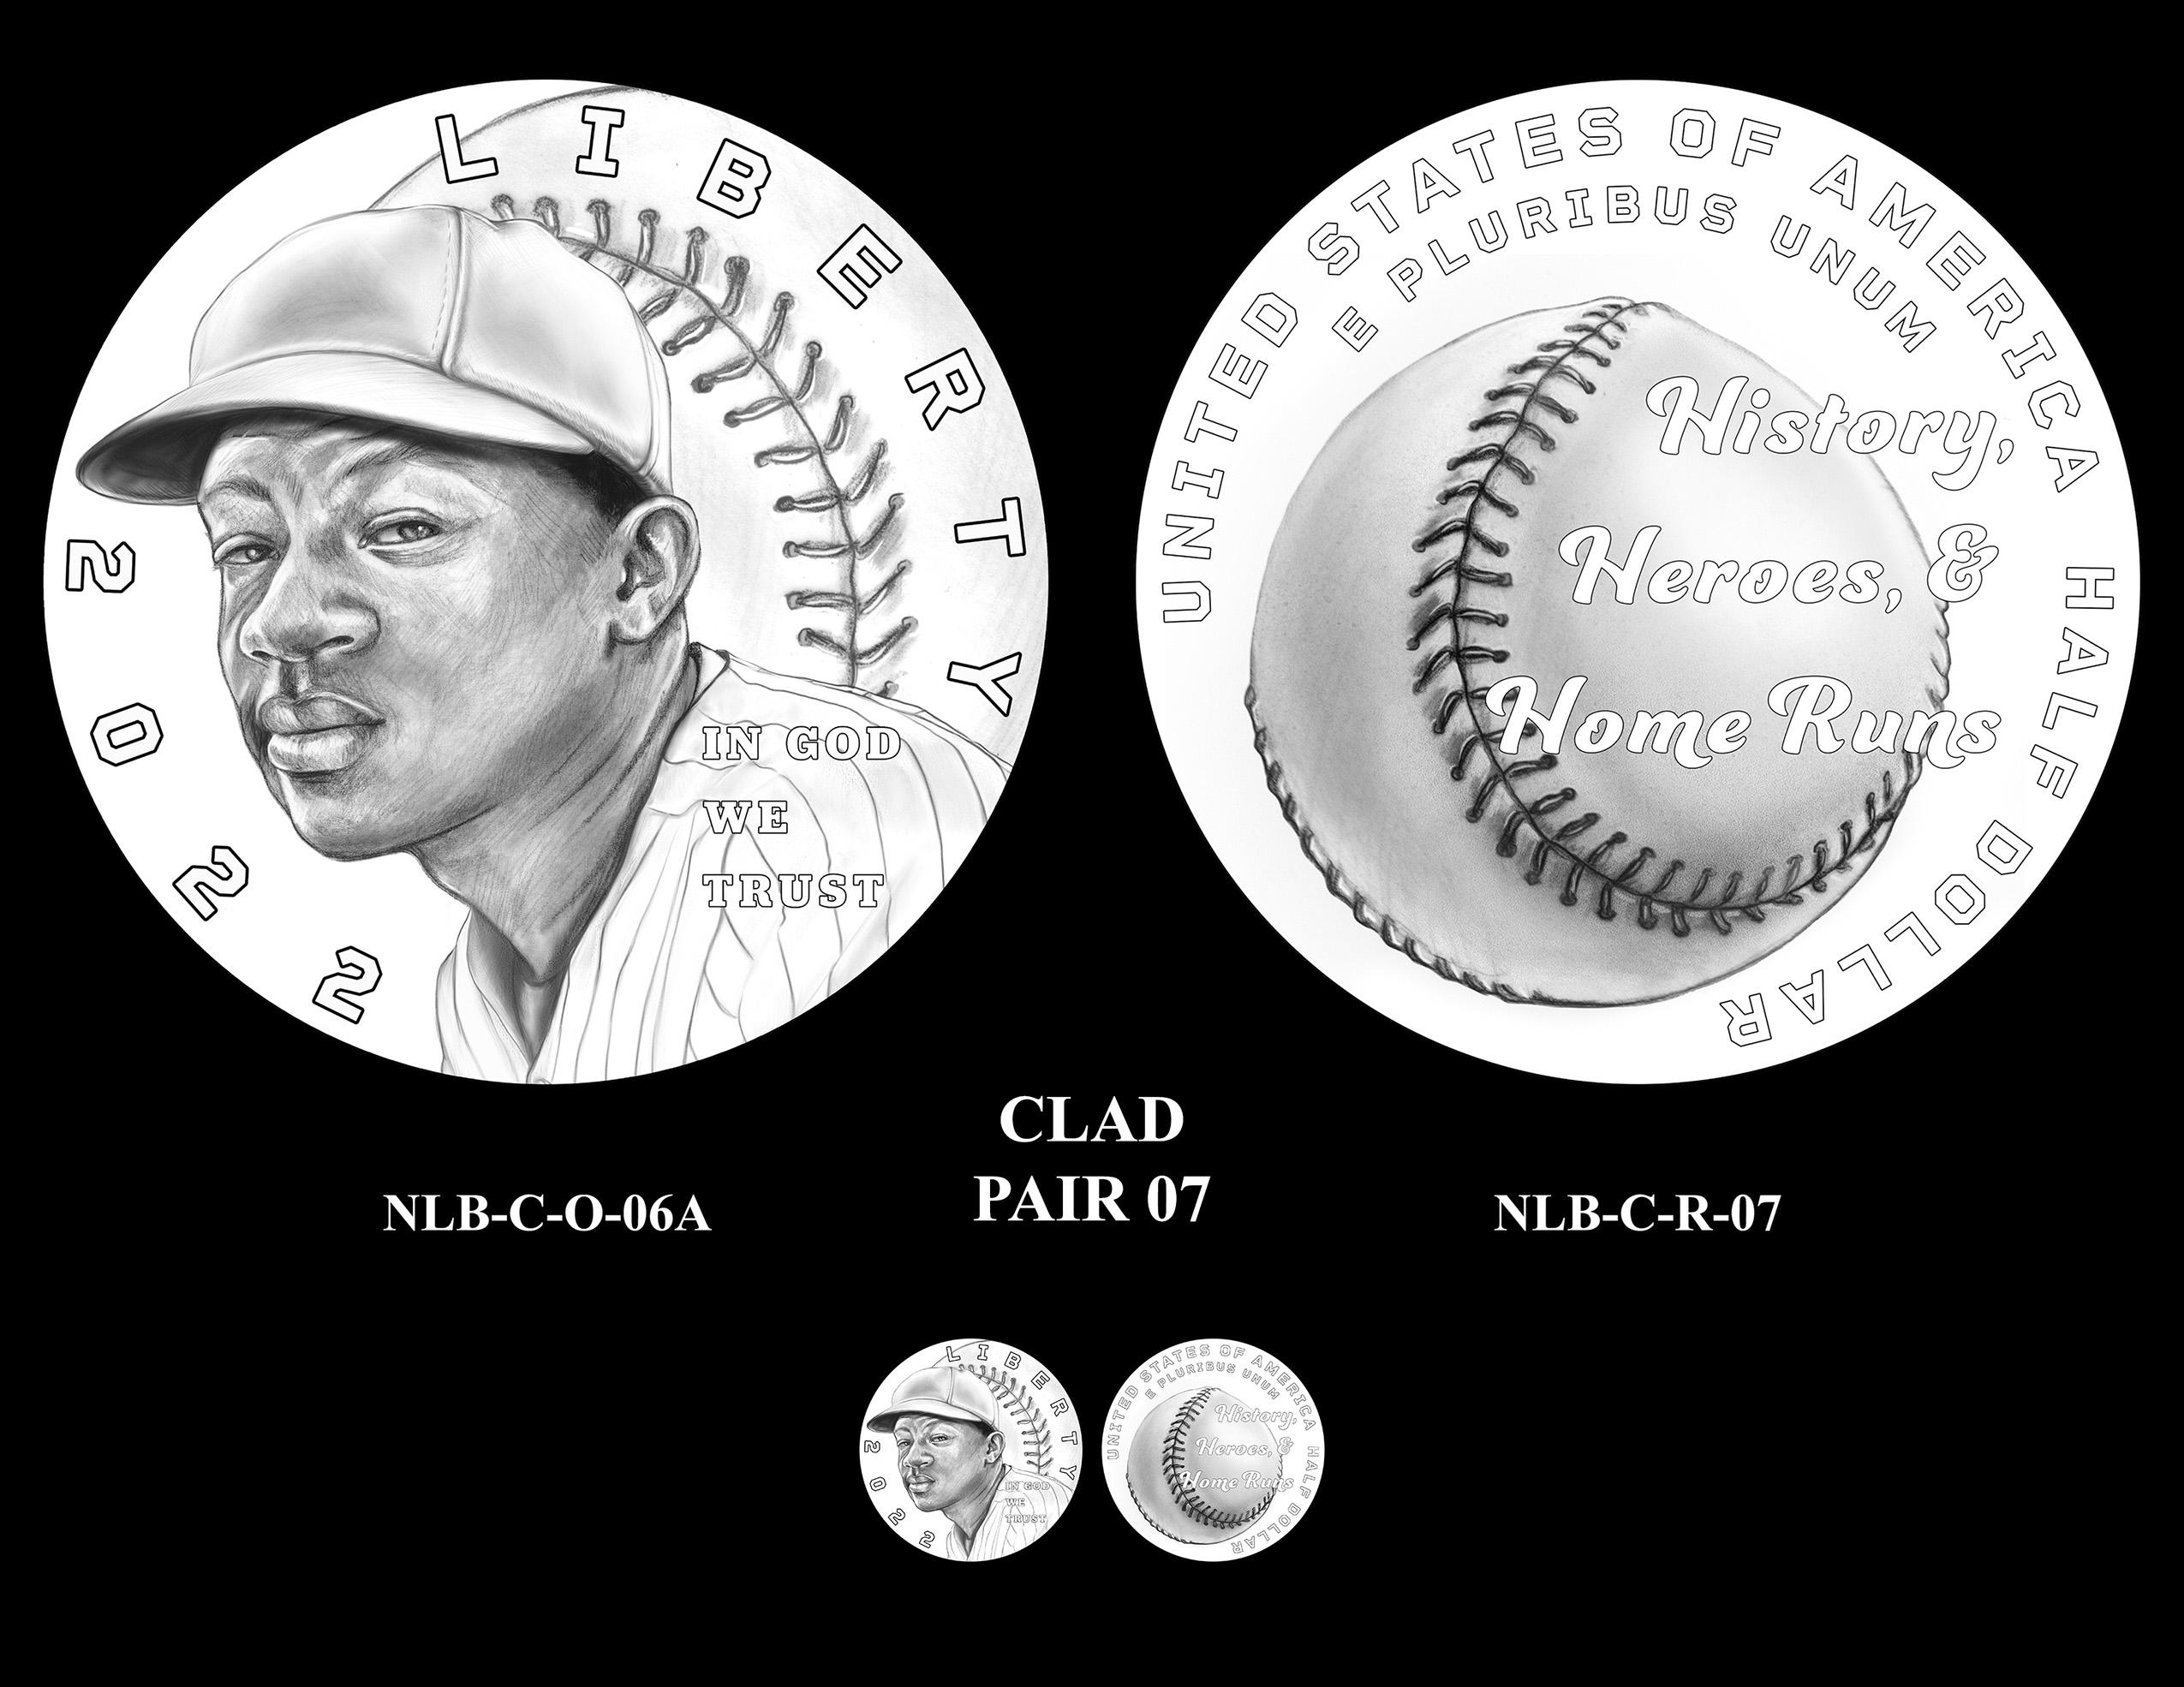 Clad Pair 07 -- Negro Leagues Baseball Commemorative Coin Program